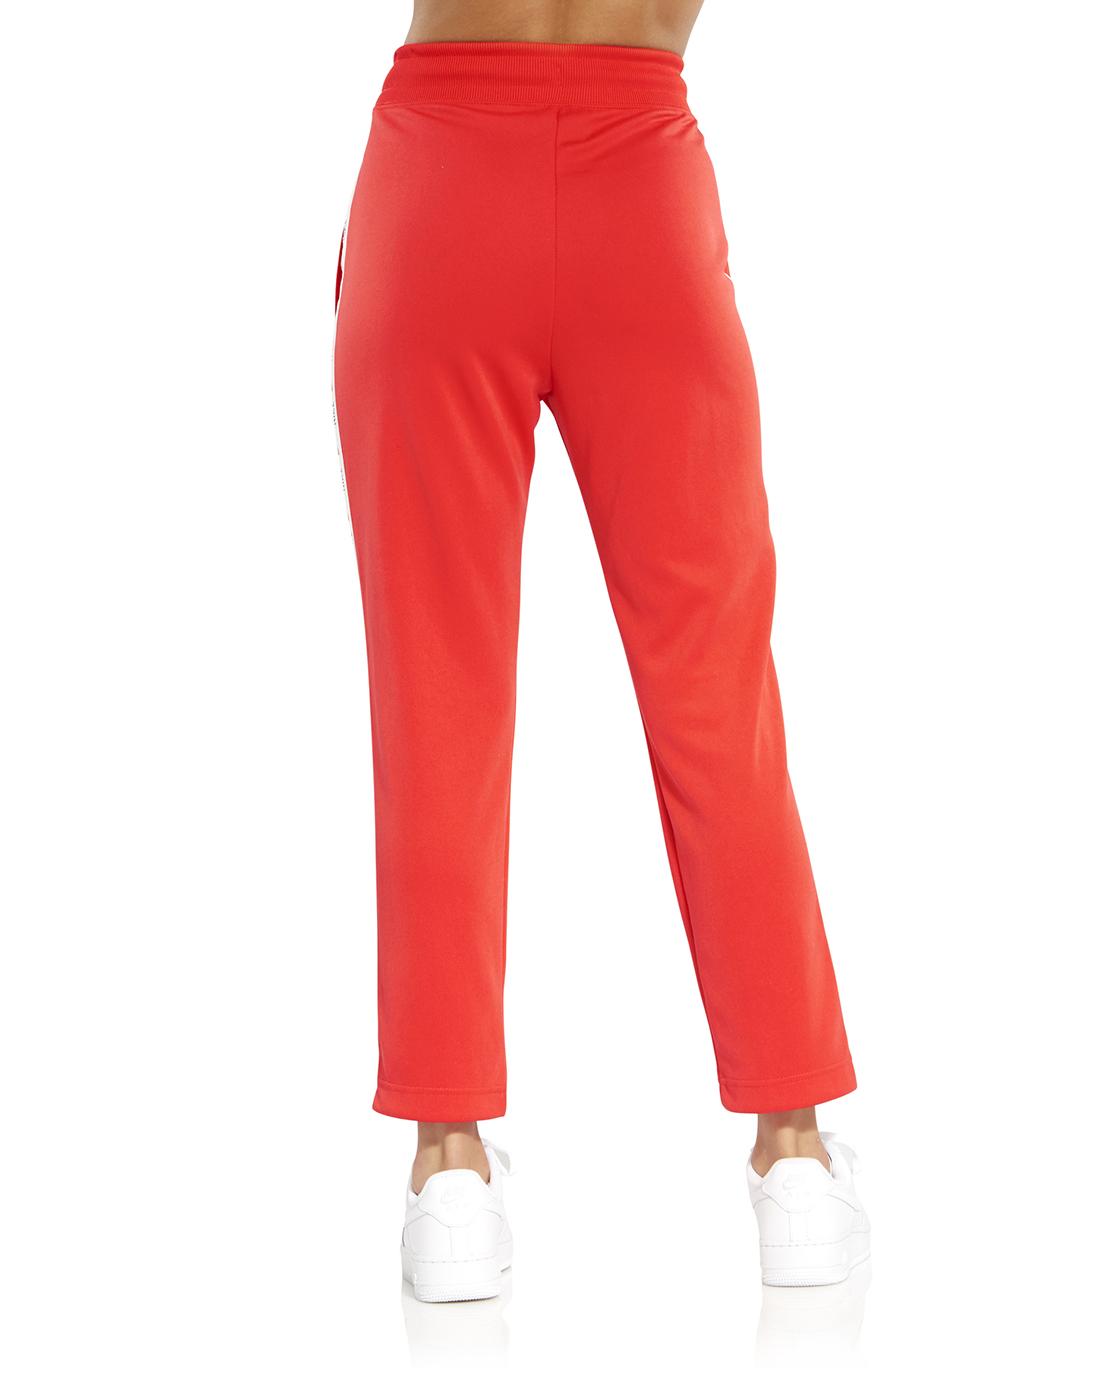 ba5b08fc Women's Red Nike Hyper Femme Floral Pants | Life Style Sports